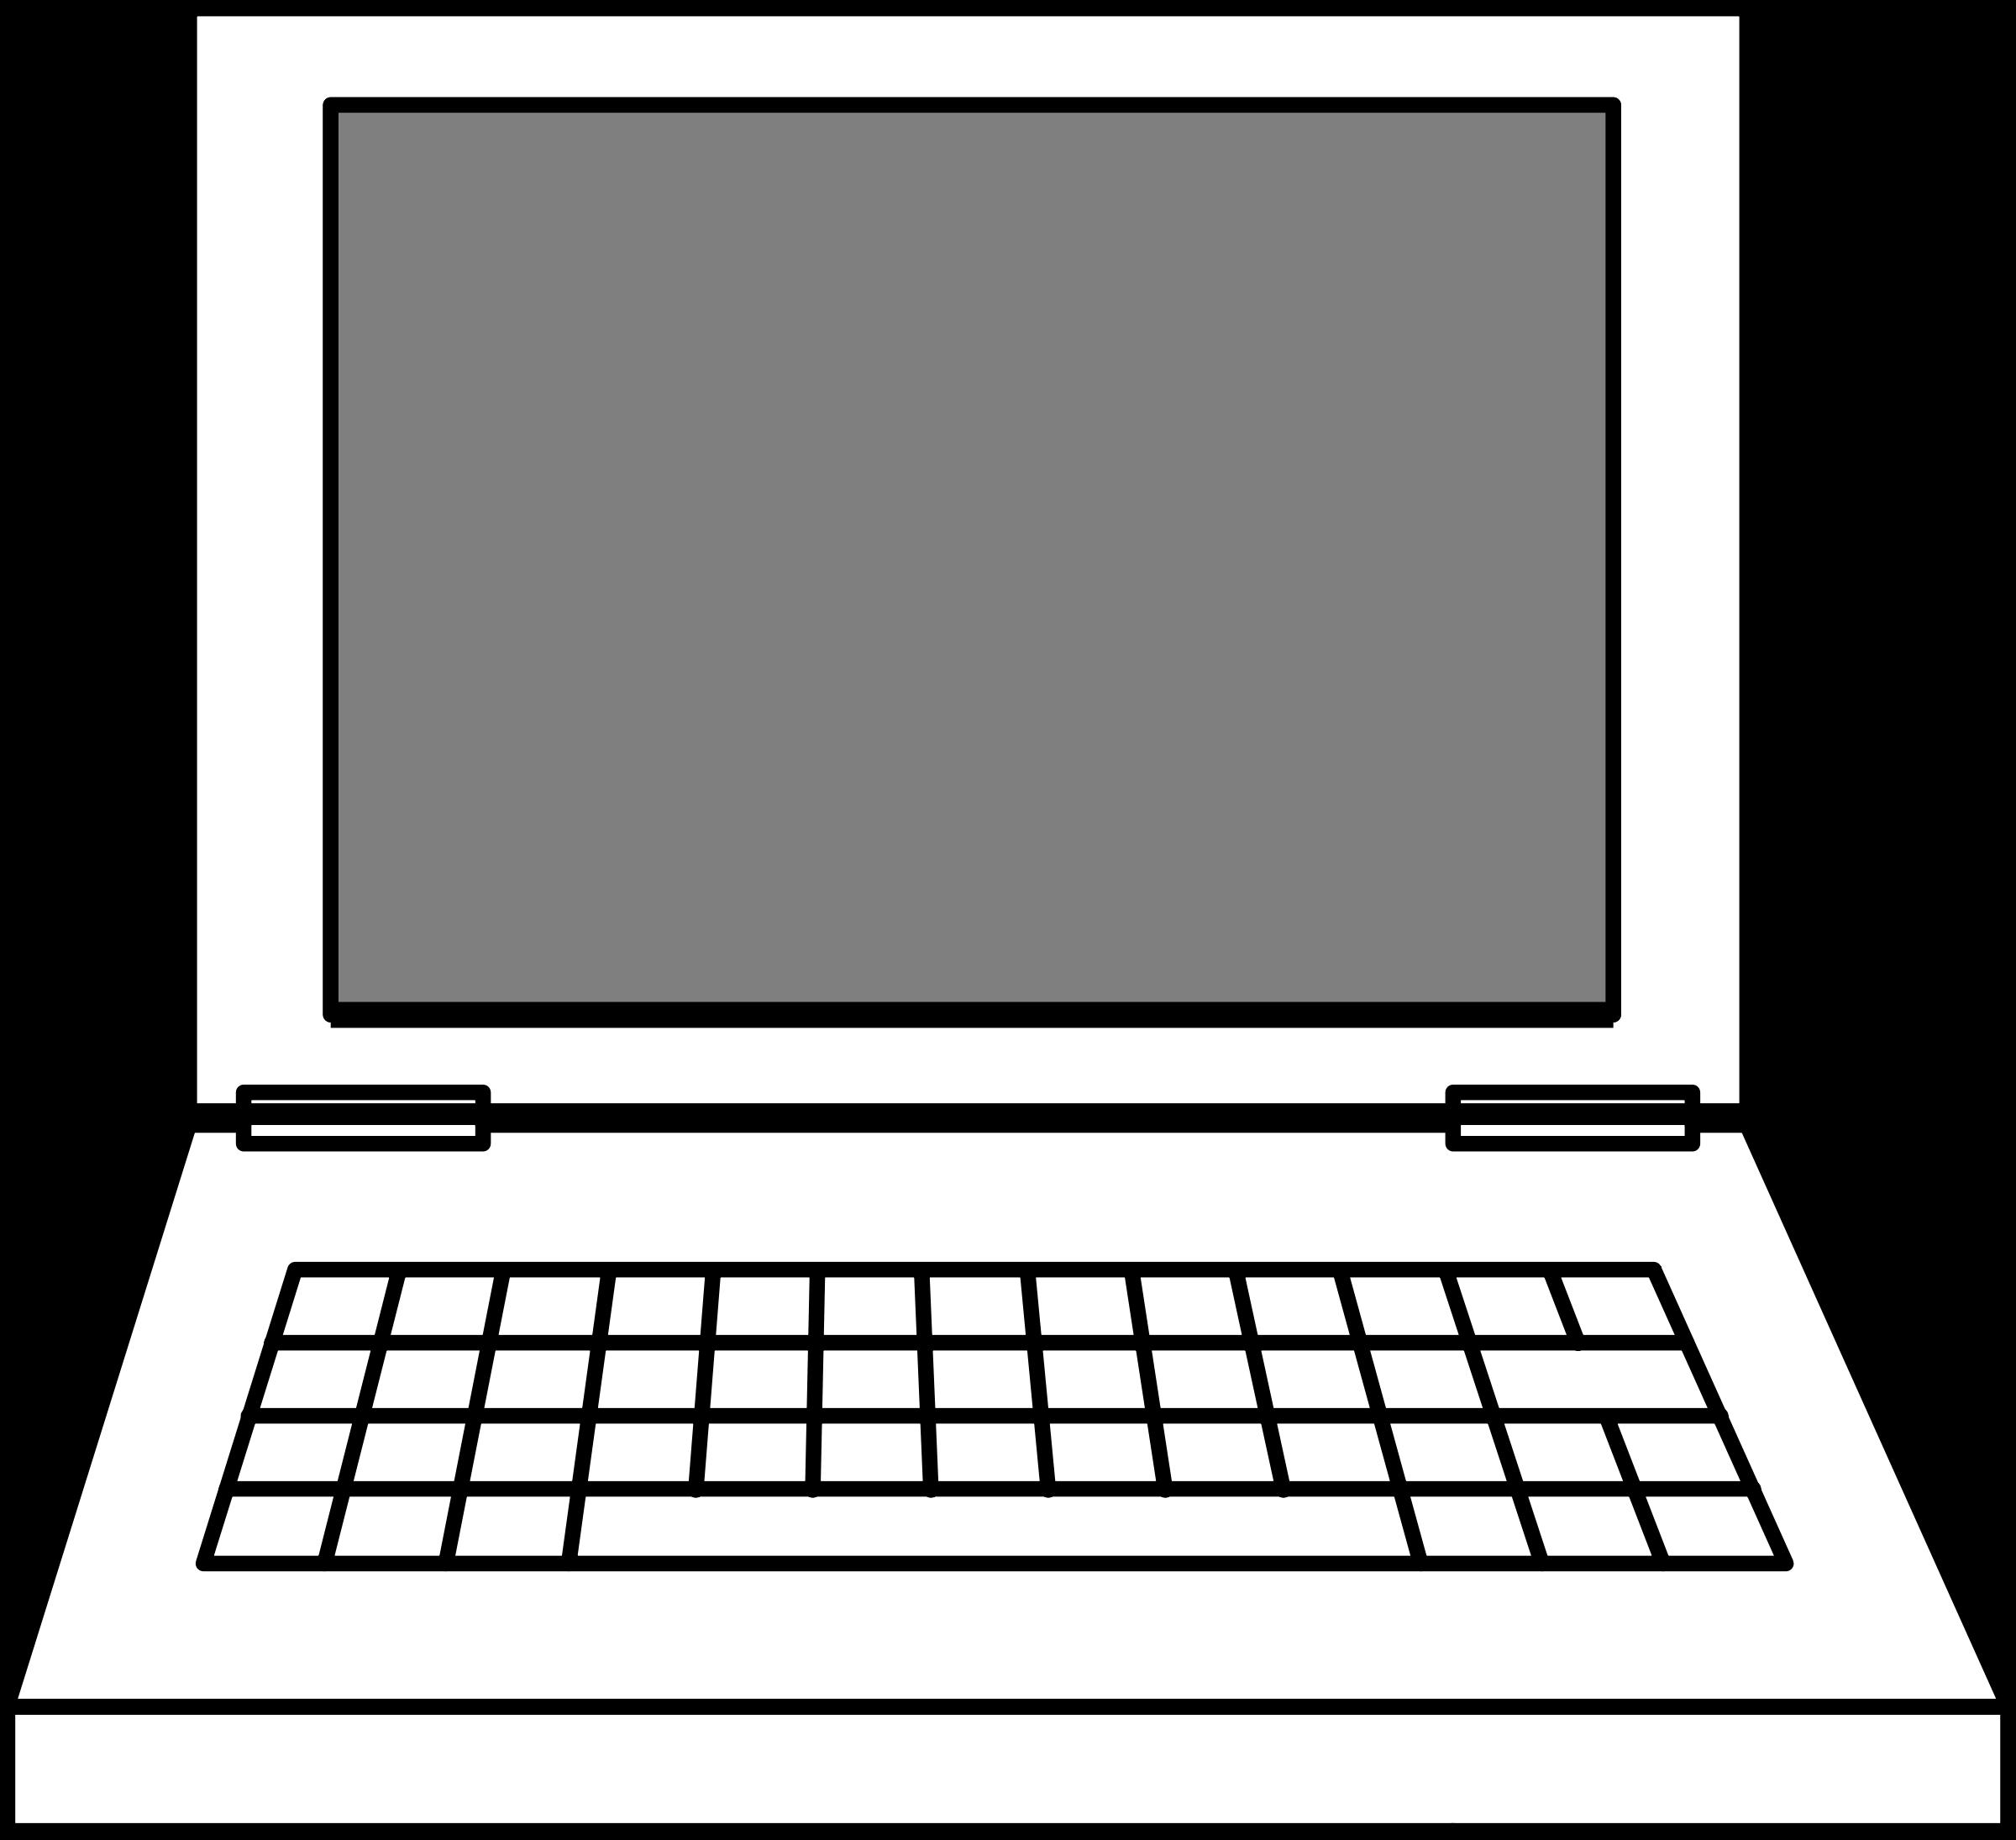 Computer clipart transparent background clipart transparent Laptop Black and white Free content Clip art - Space Computer ... clipart transparent